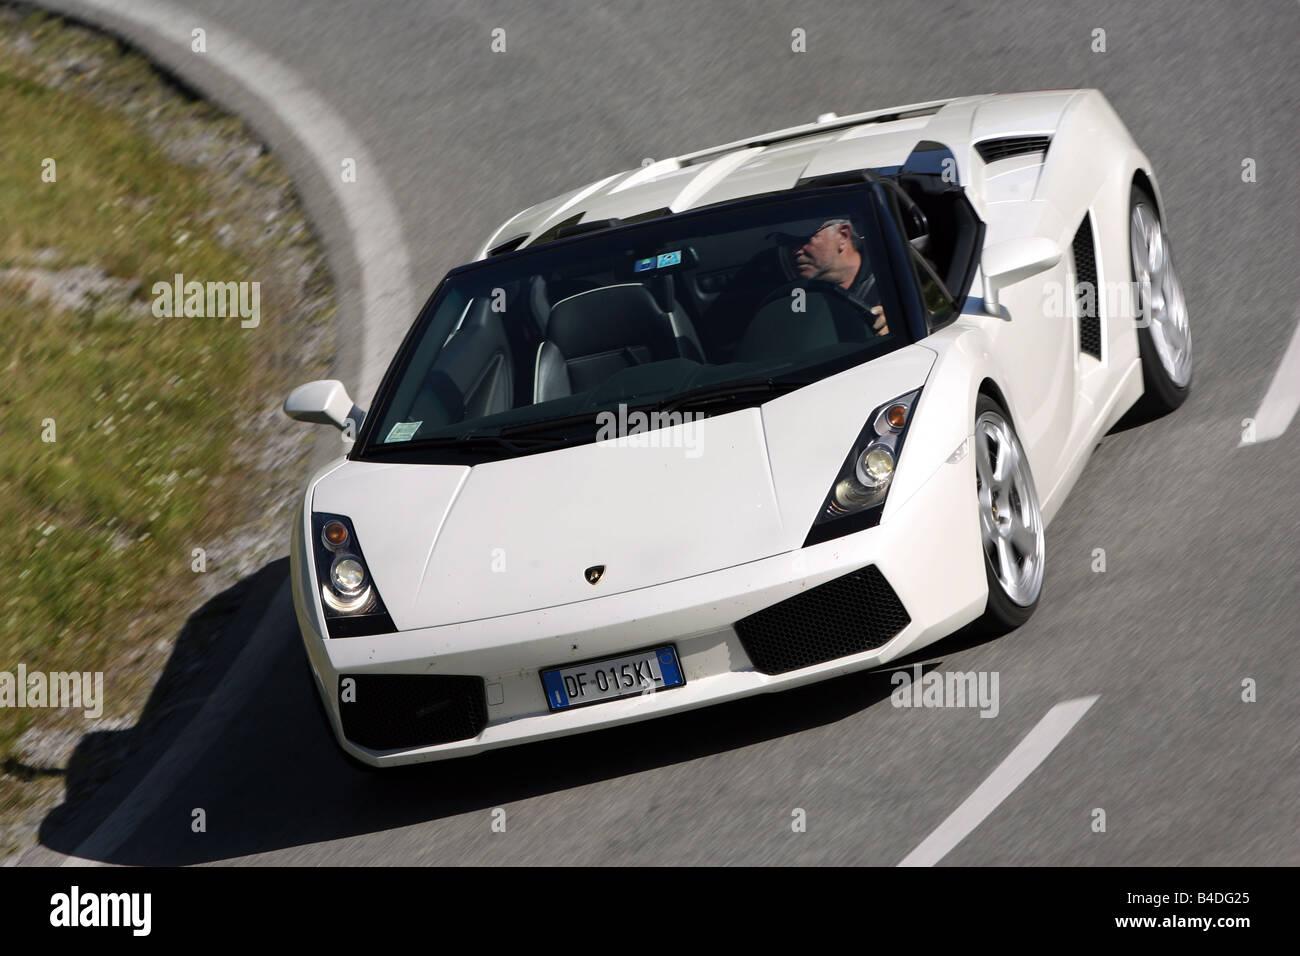 Lamborghini Gallardo Spyder Model Year 2005 White Driving Stock